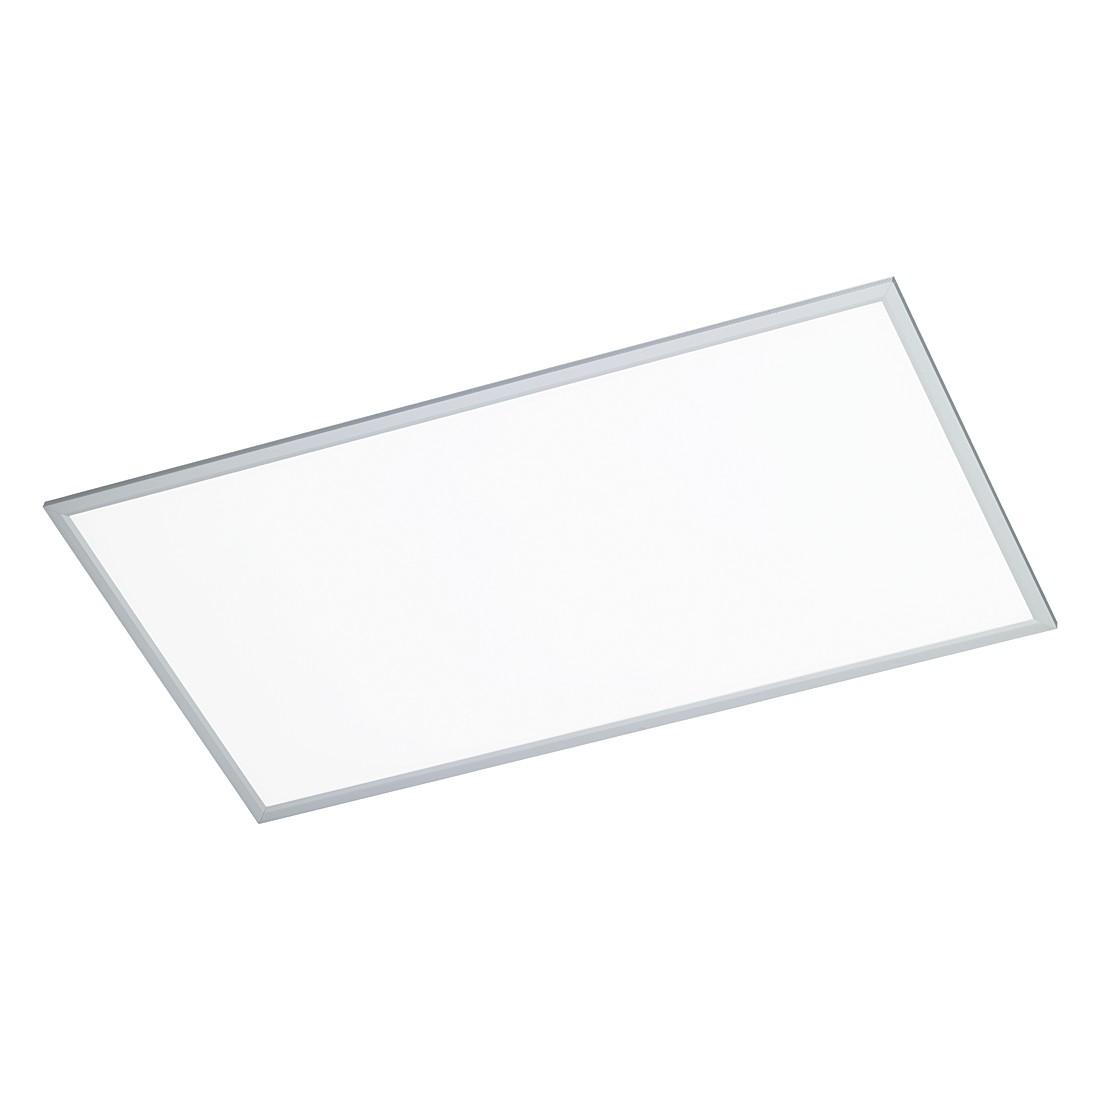 LED-Deckenleuchte LIV ● Metall/Kunststoff ● 1-flammig- Lux A+